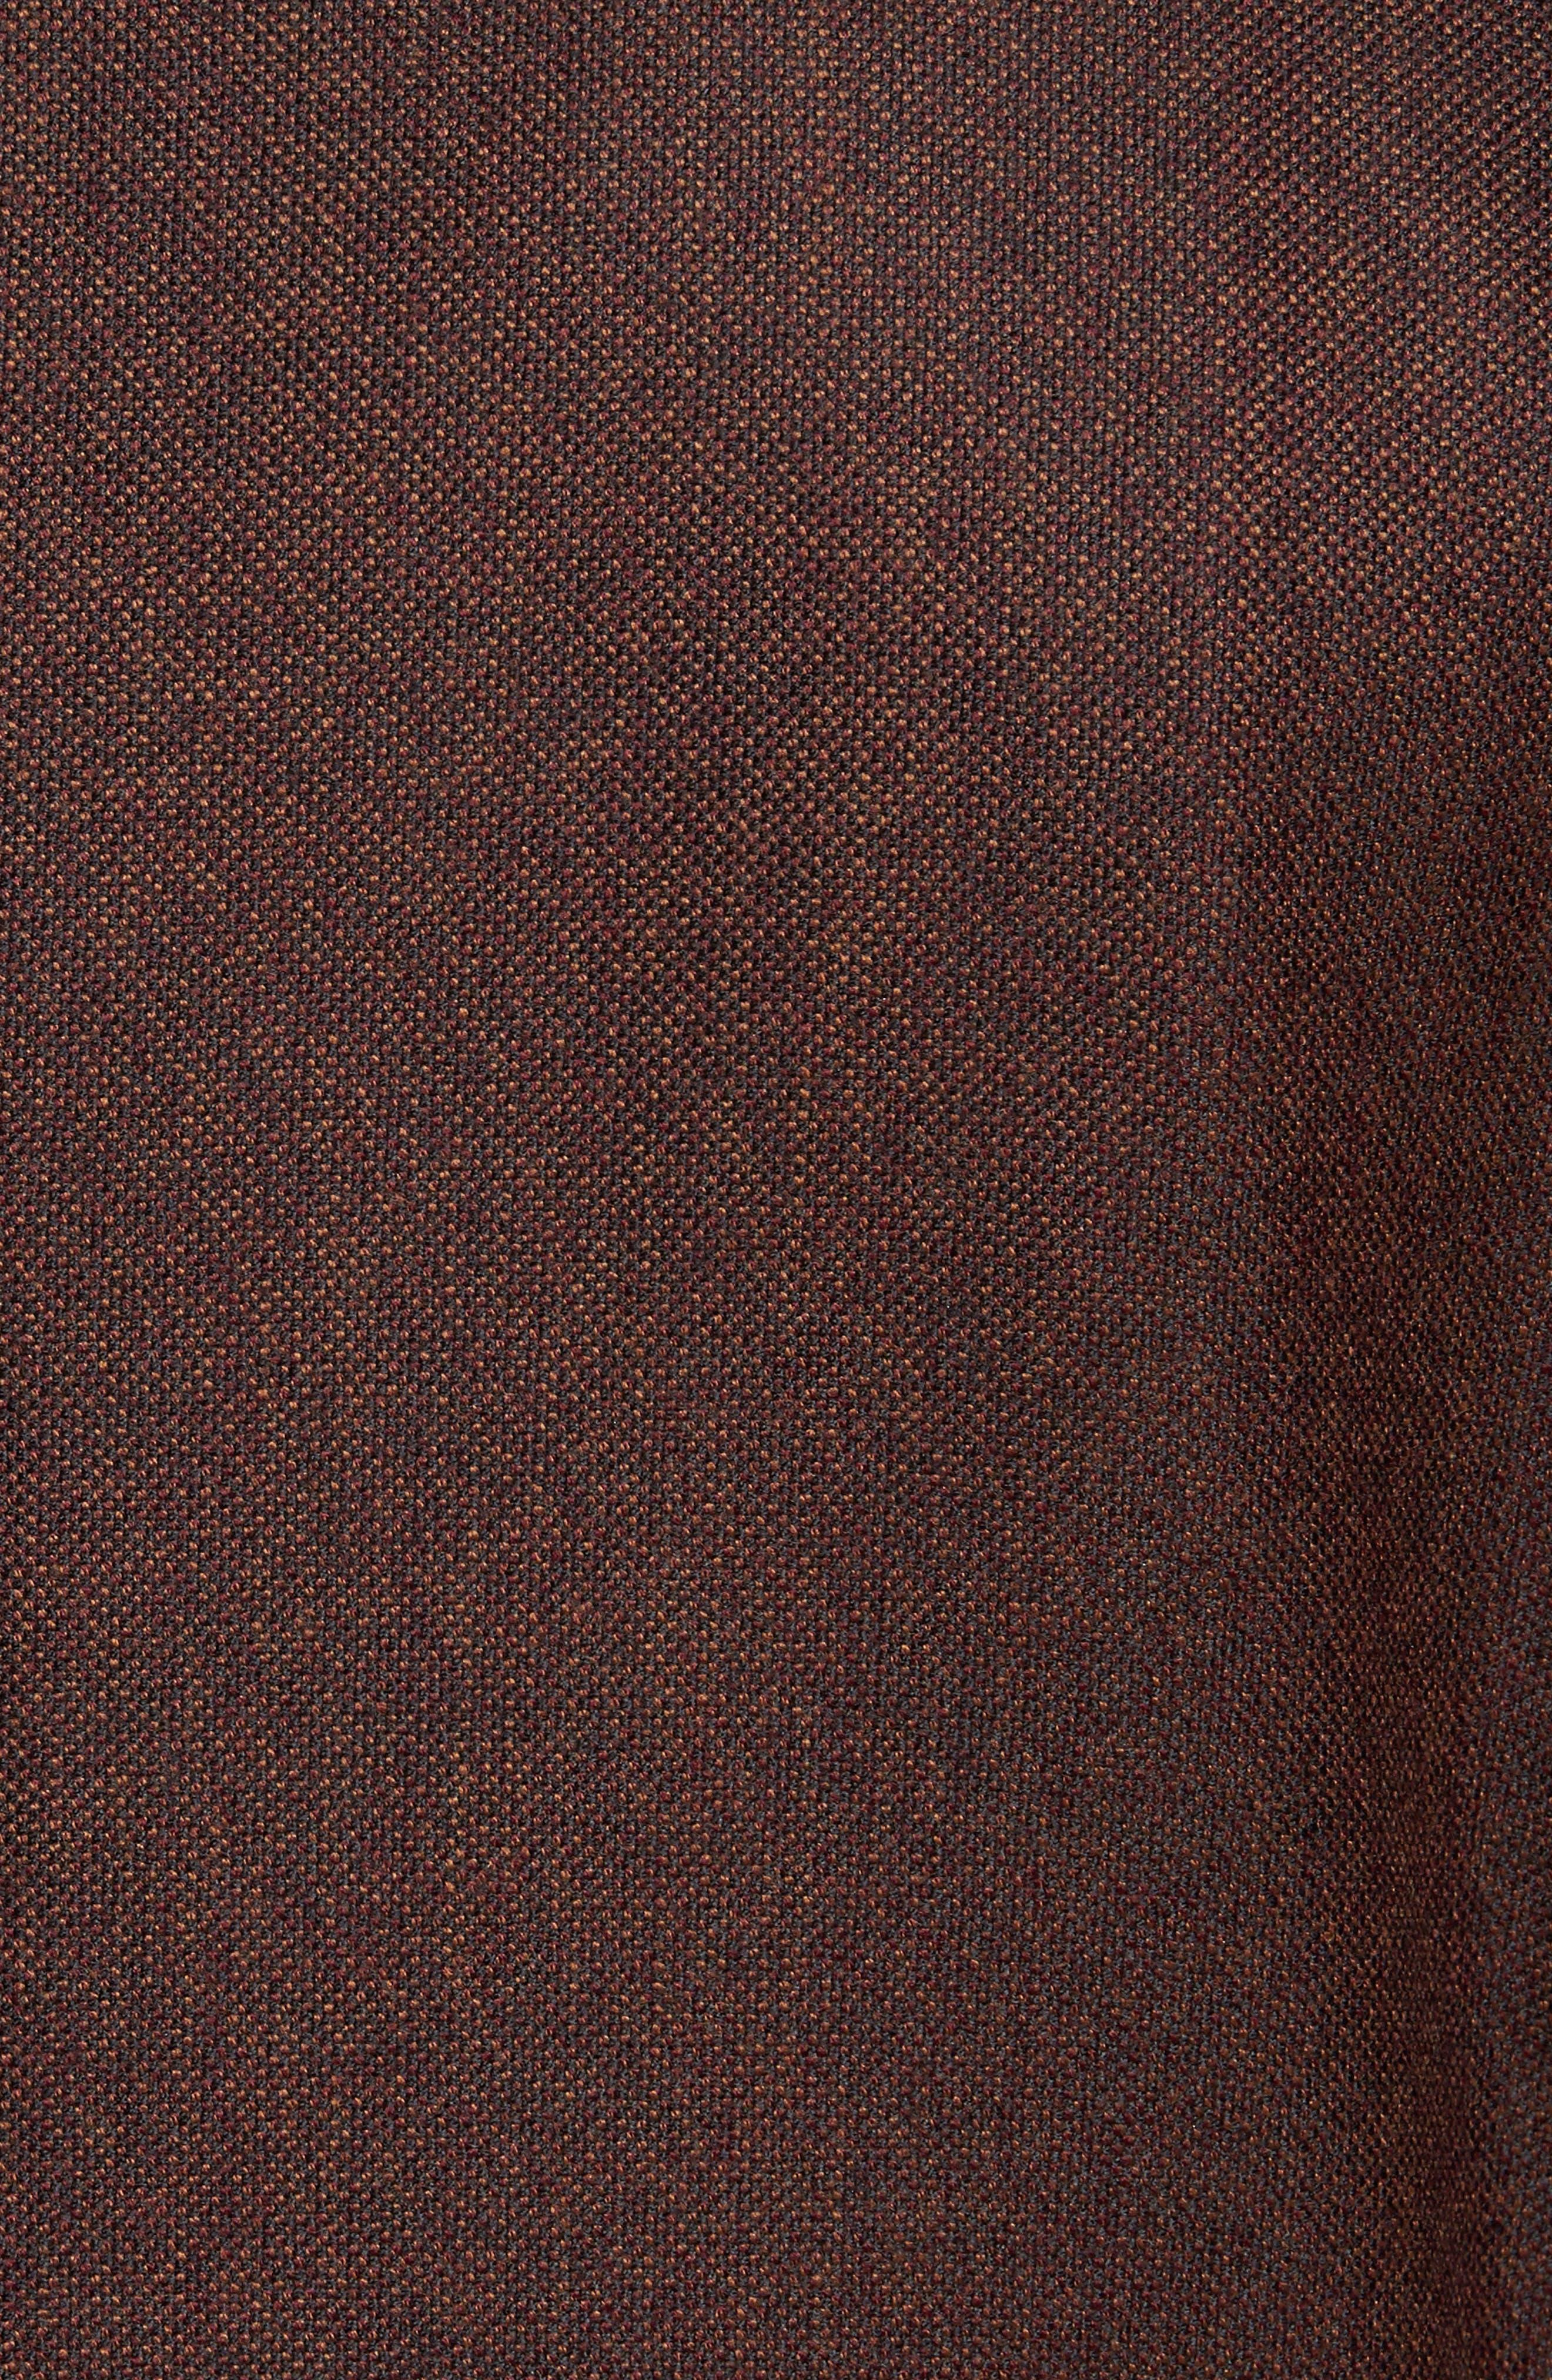 Aiden Classic Fit Wool Sport Coat,                             Alternate thumbnail 6, color,                             252